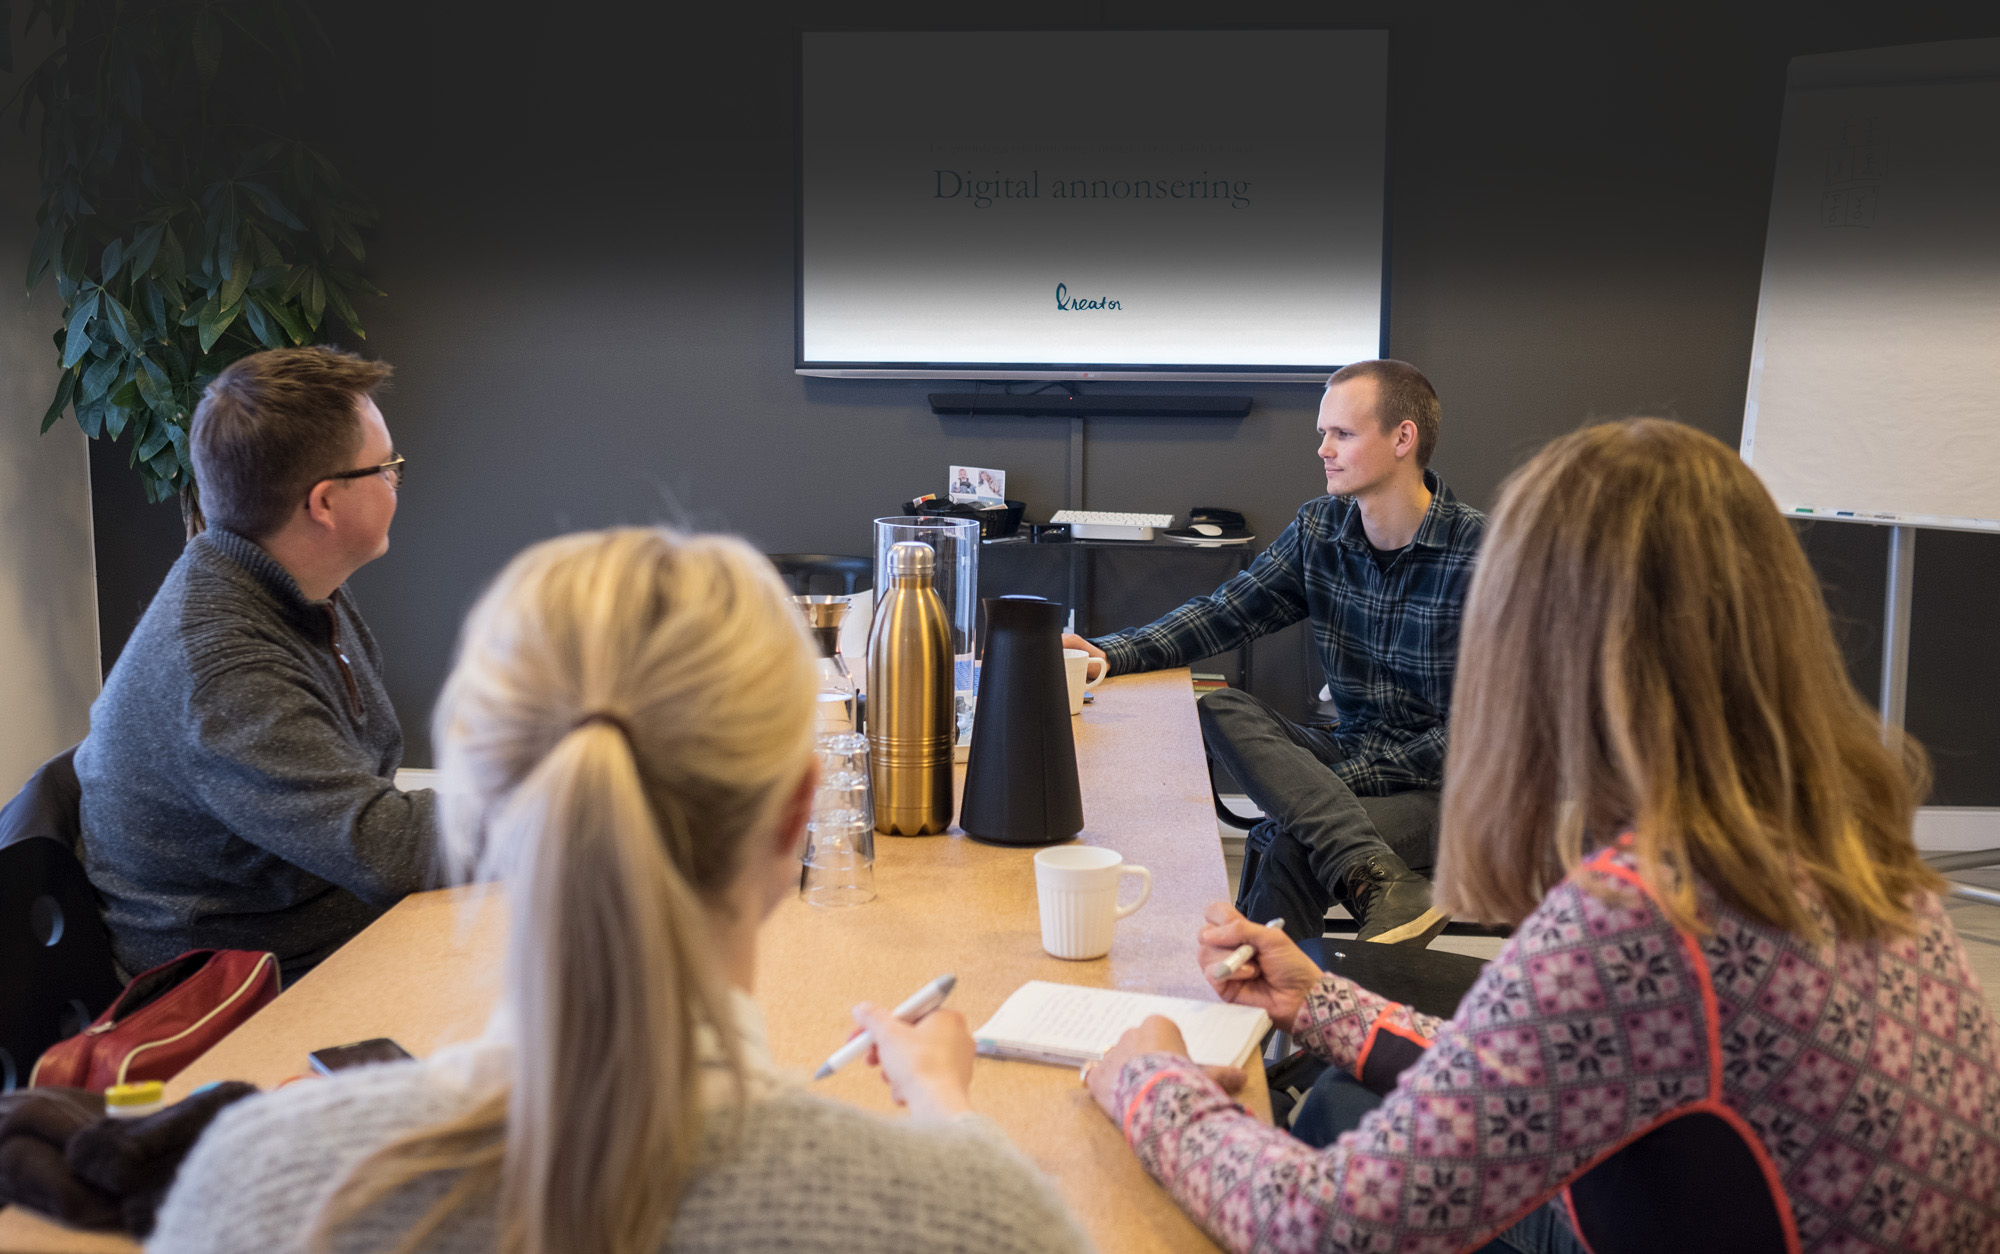 Kurs i digital annonsering